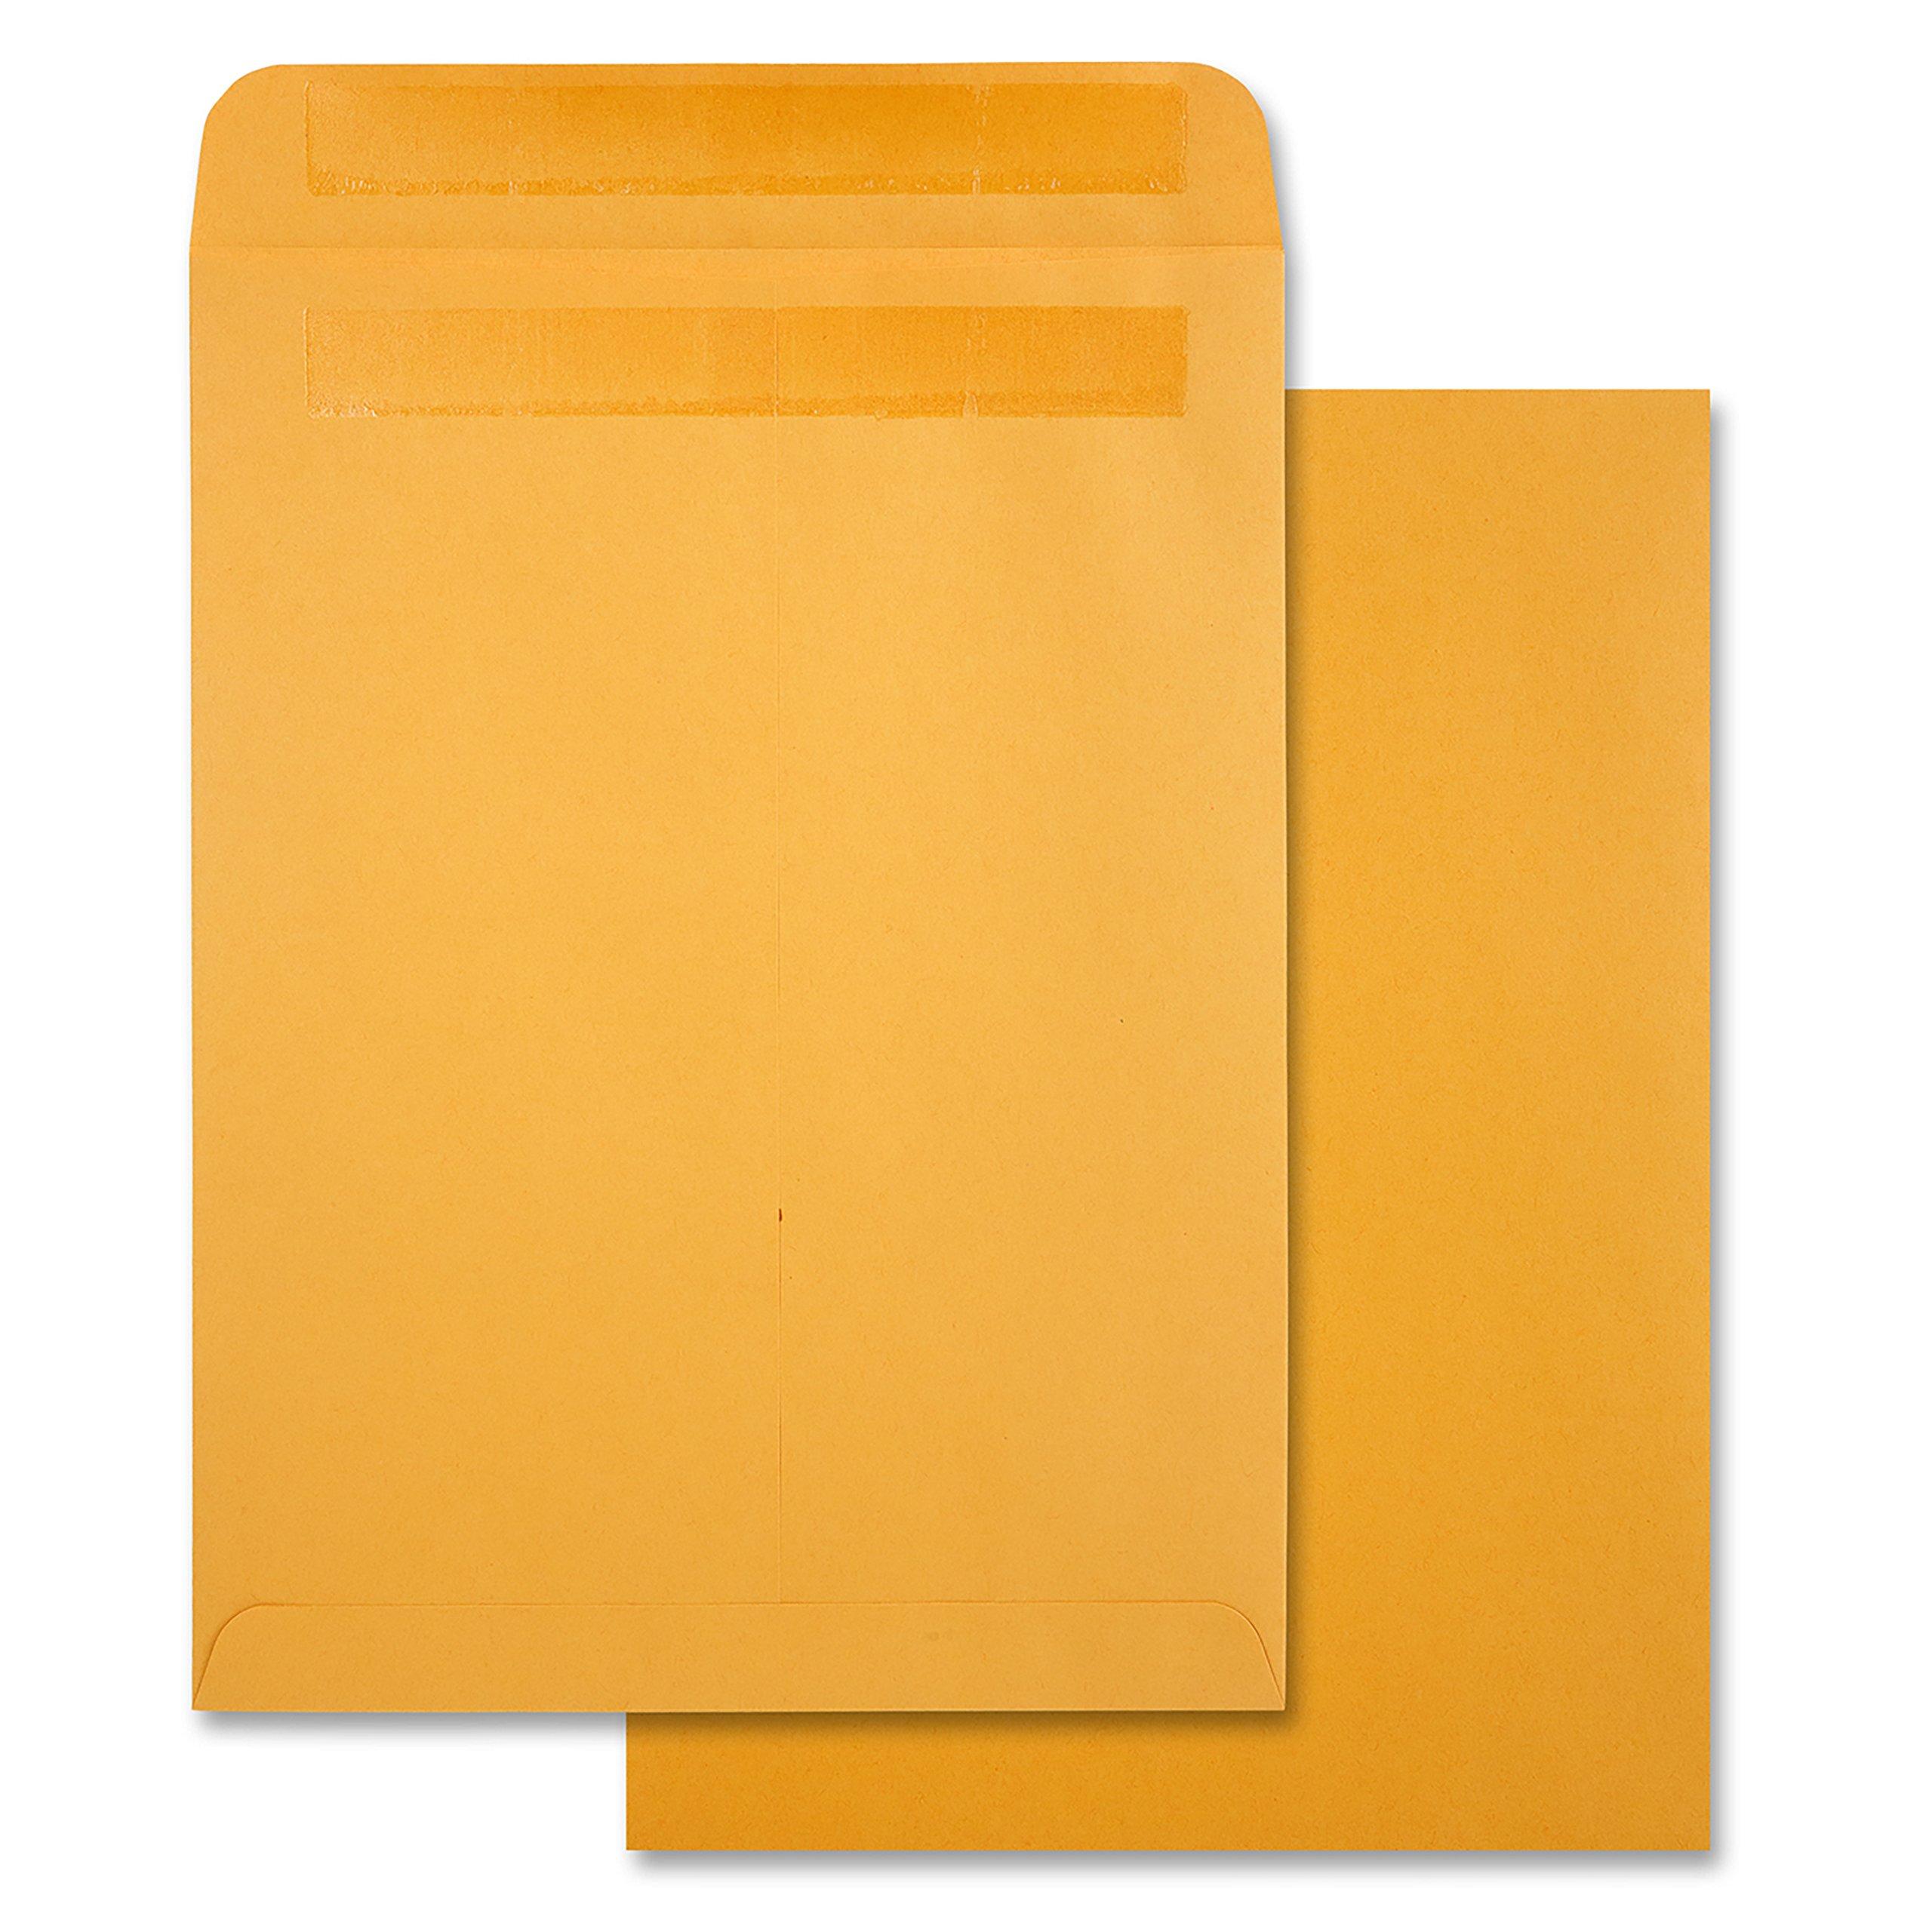 Quality Park Redi-Seal 9 x 12 Inch Kraft Catalog Envelopes 250 Count (43562)